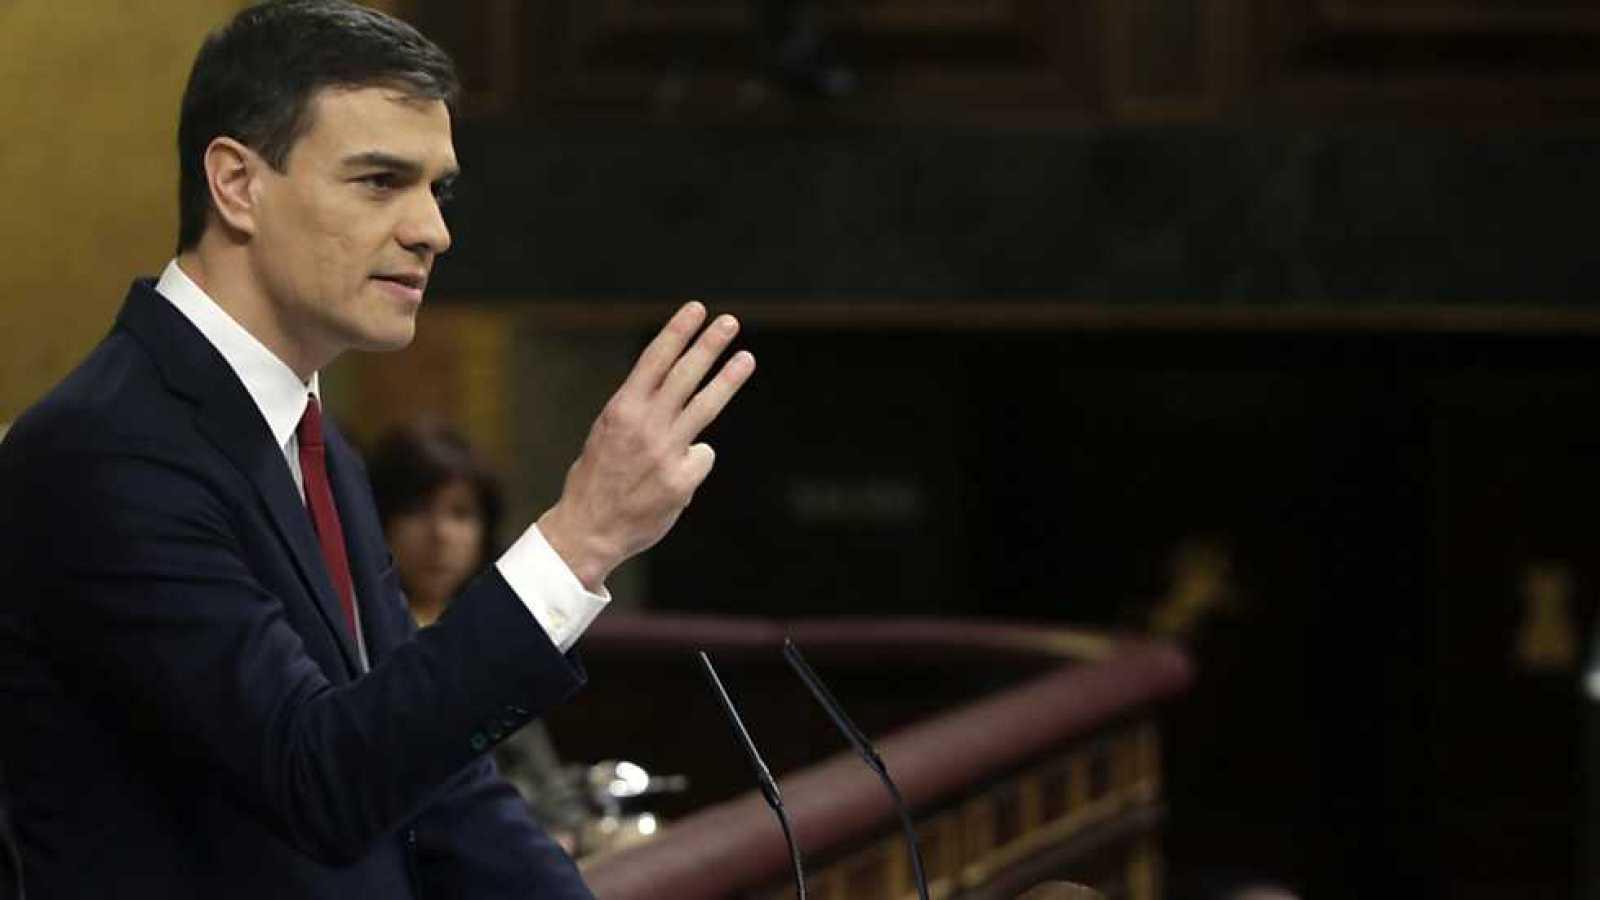 Telediario - 21 horas - 01/03/16 - RTVE.es